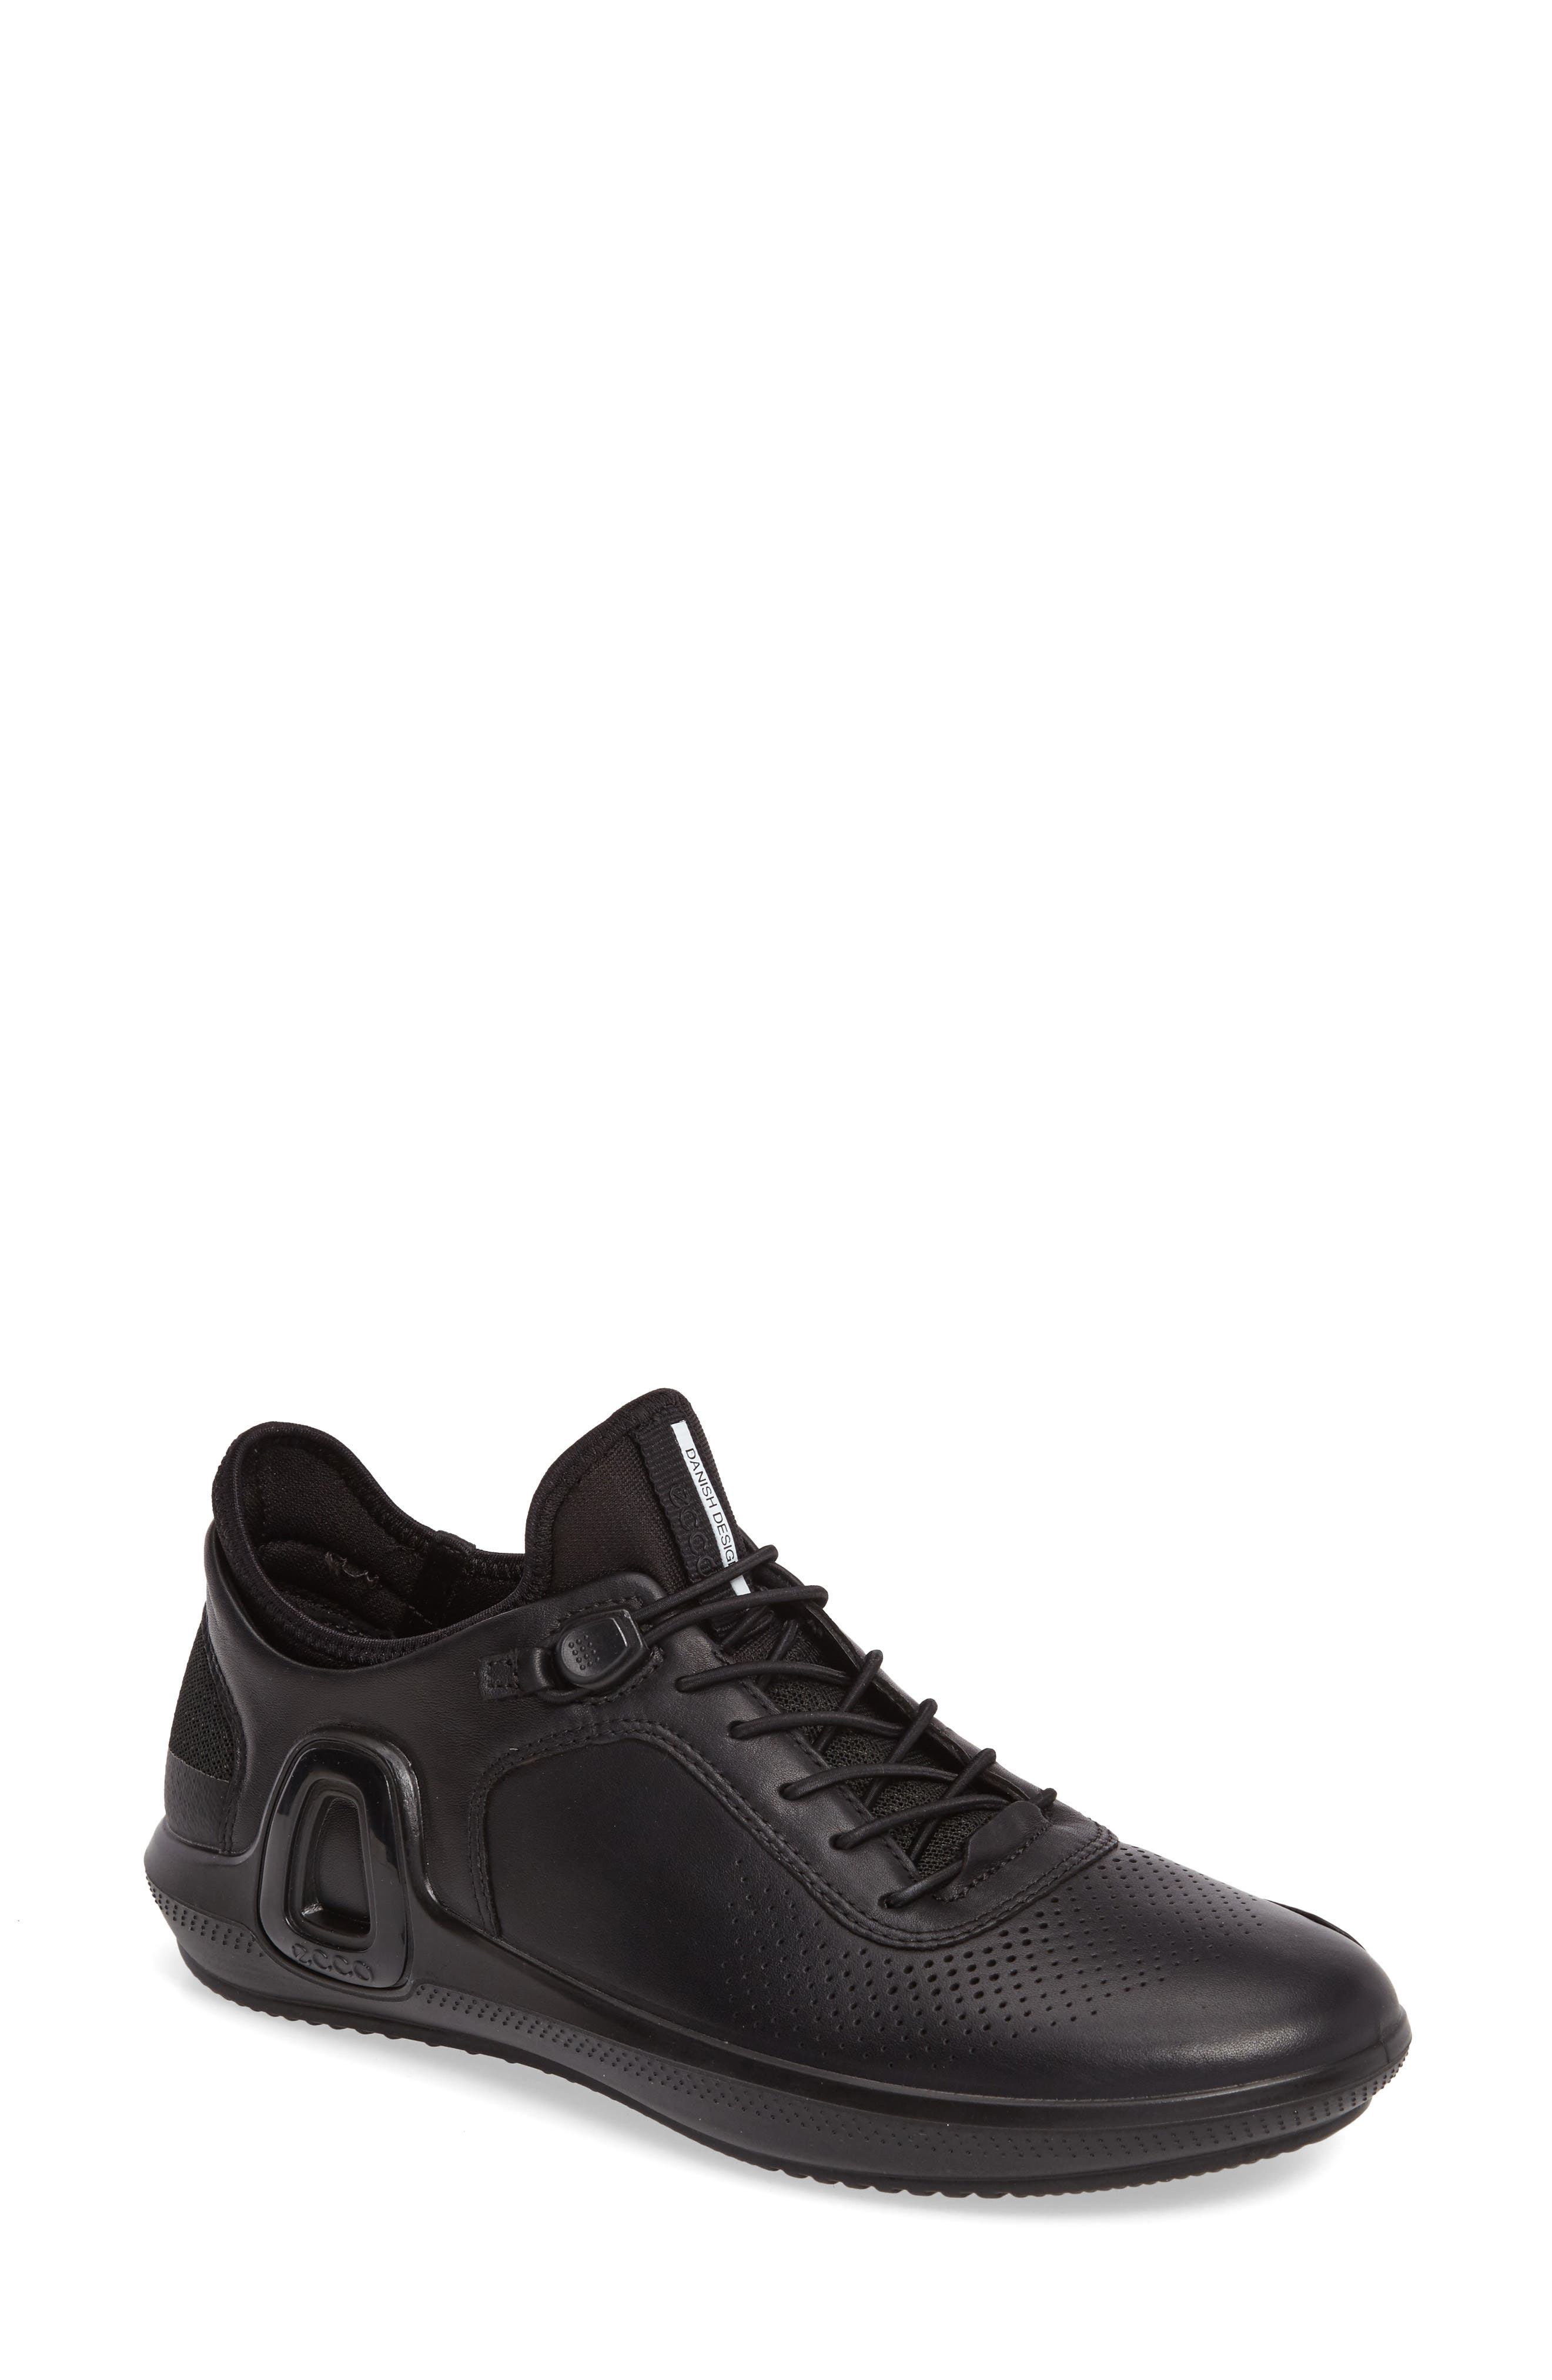 Intrinsic 3 Sneaker,                             Main thumbnail 1, color,                             002